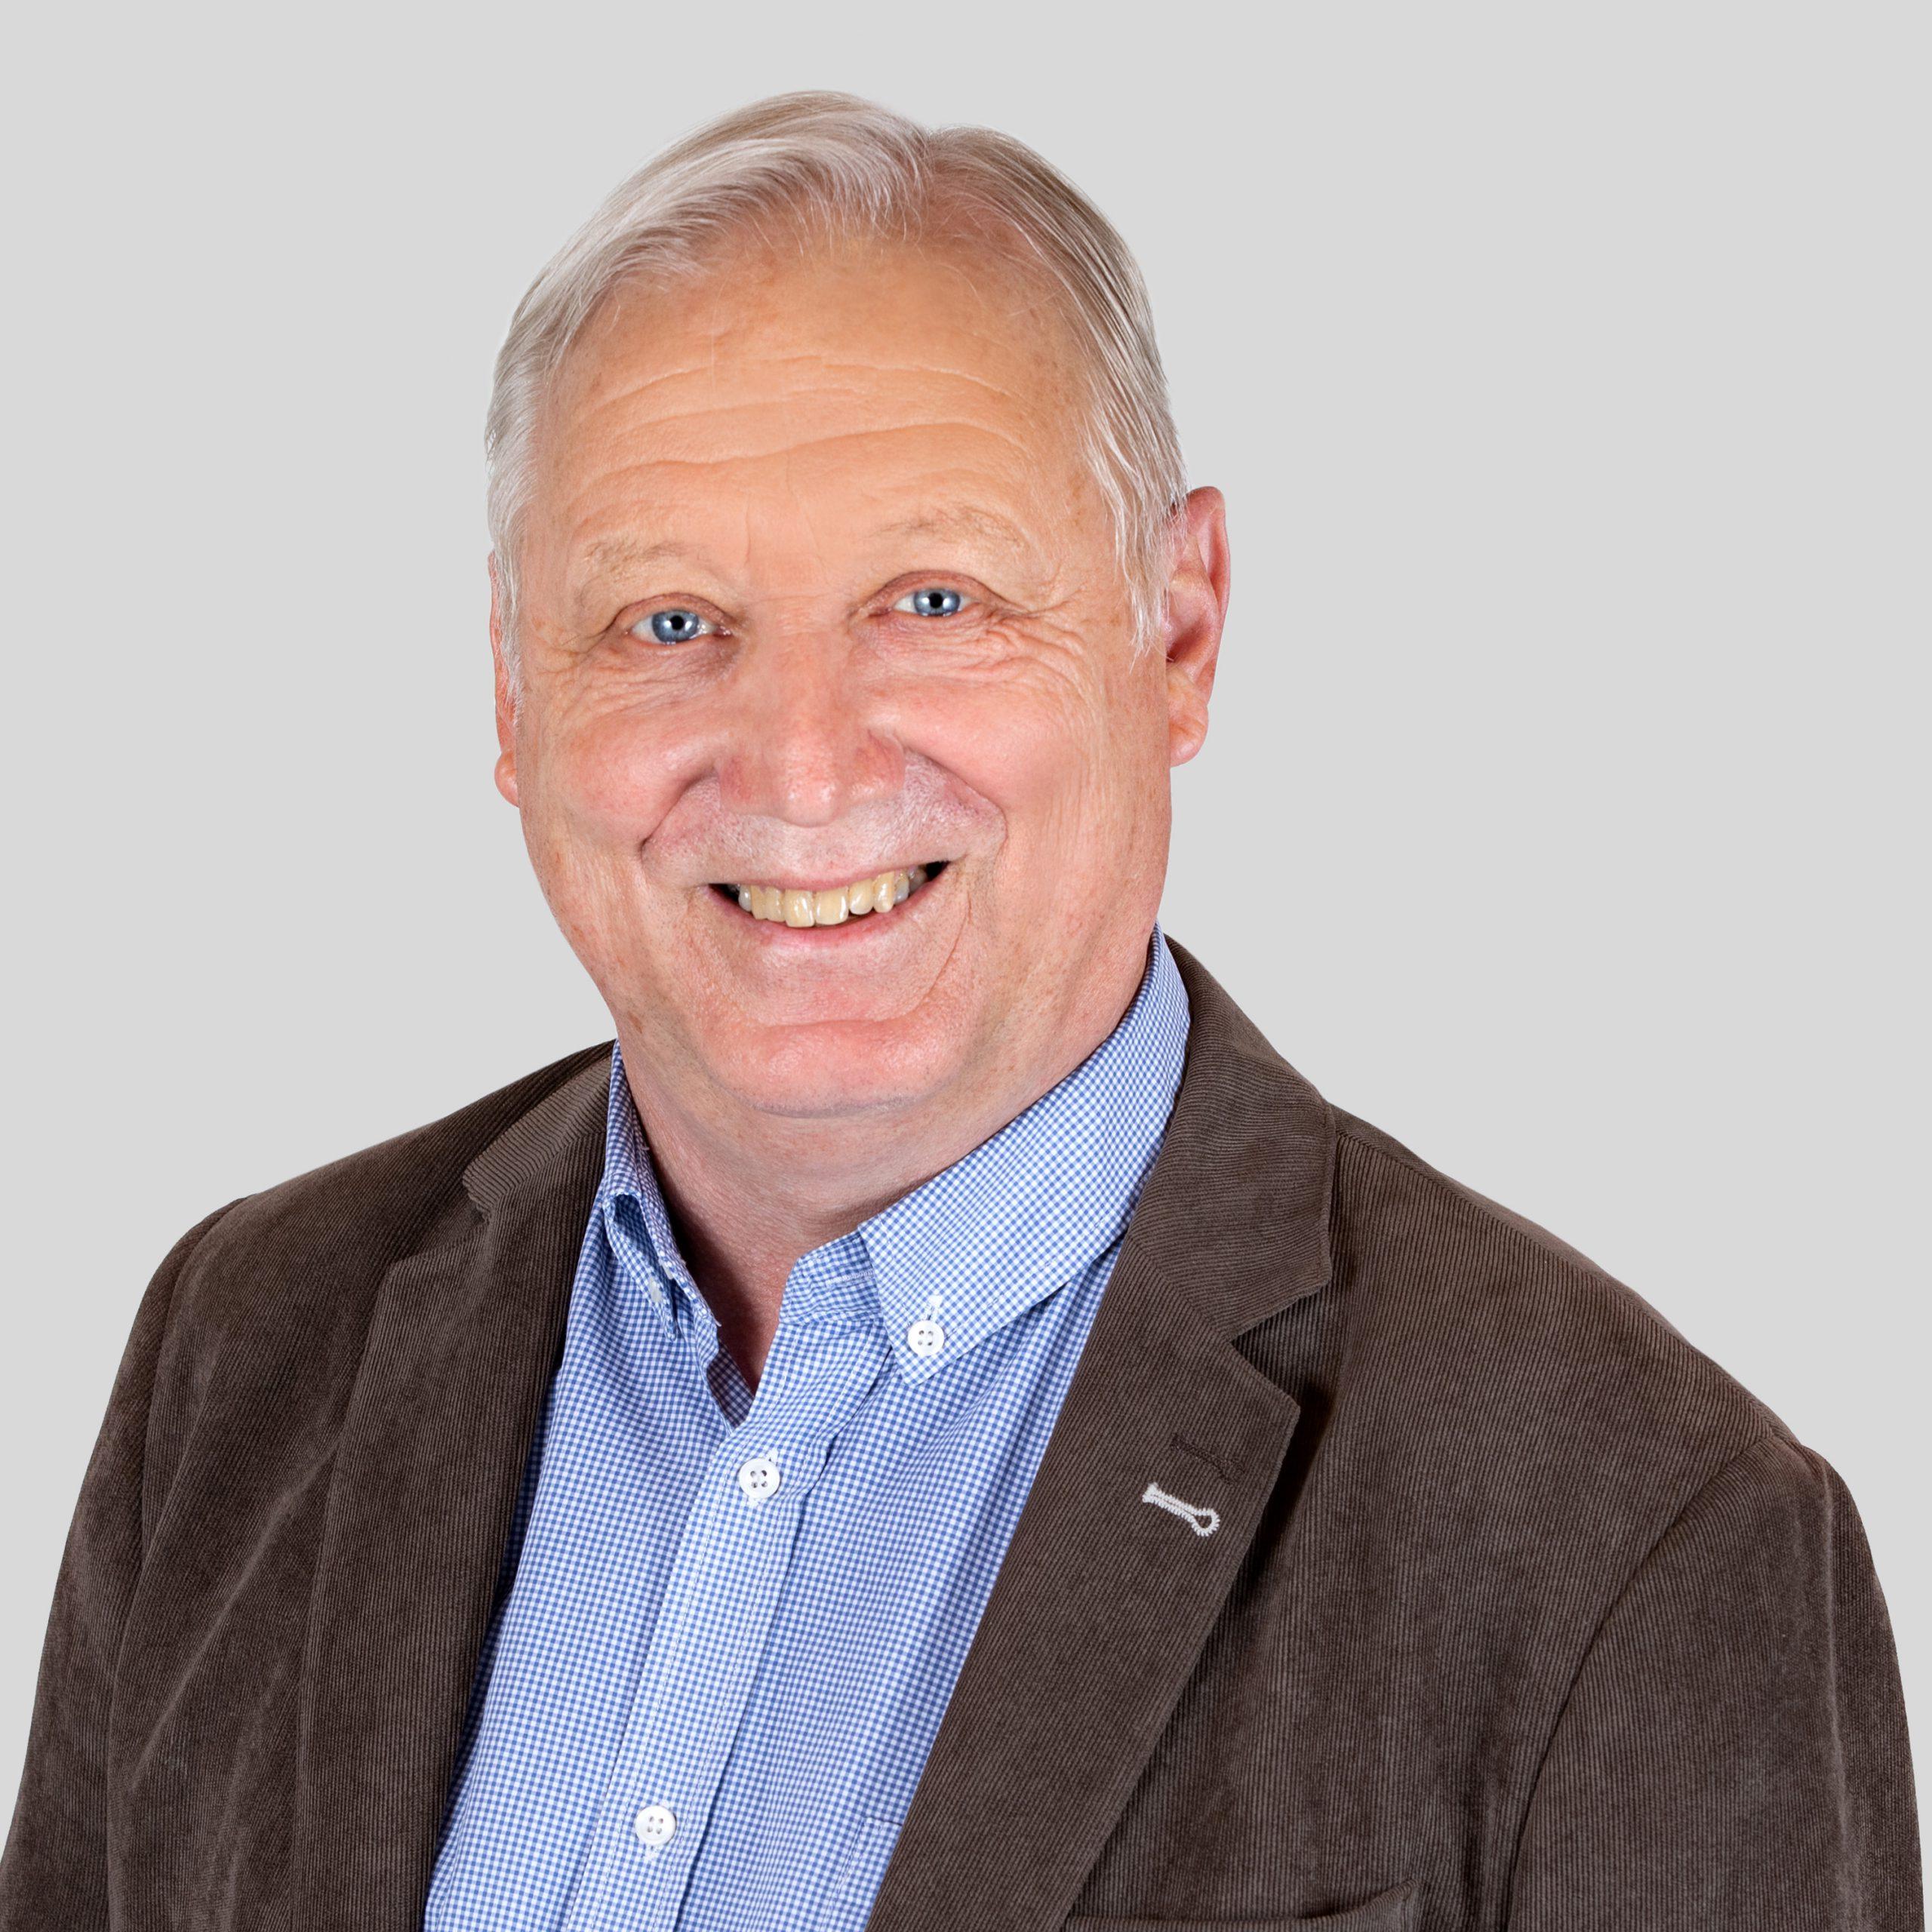 Peter Brotschi